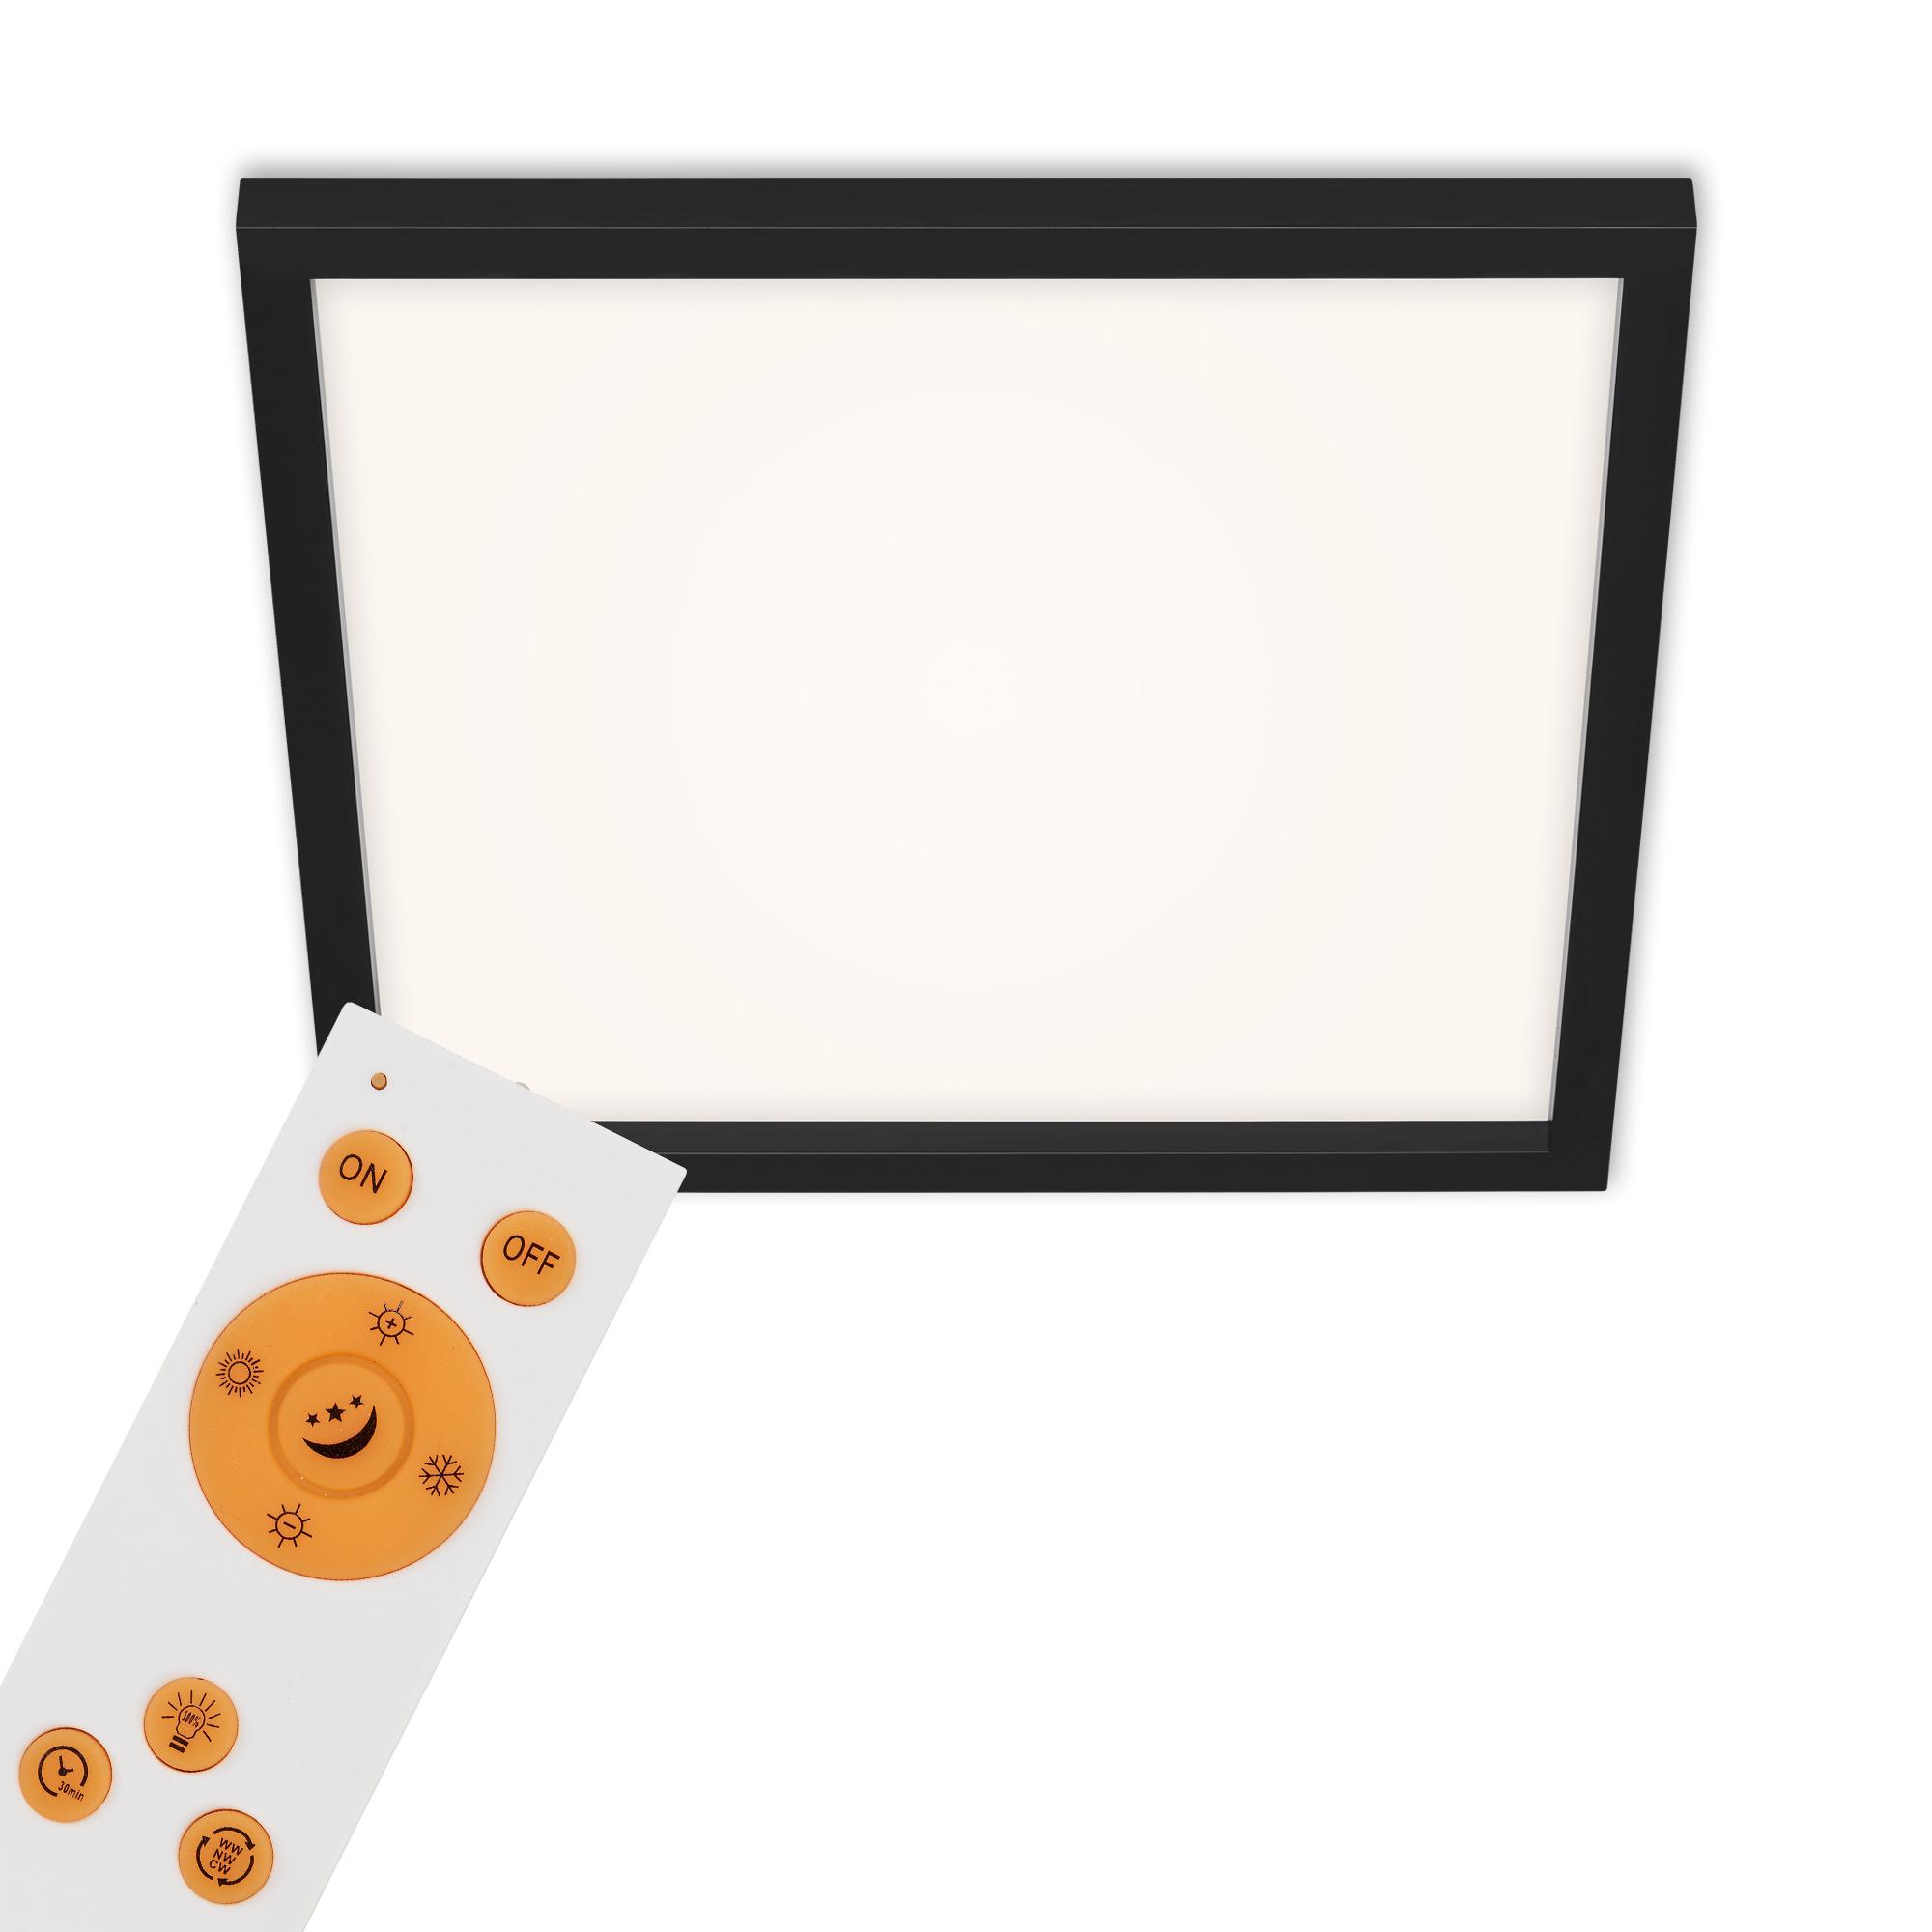 CCT LED Panel, 44,5 cm, 2400 LUMEN, 24 WATT, Schwarz